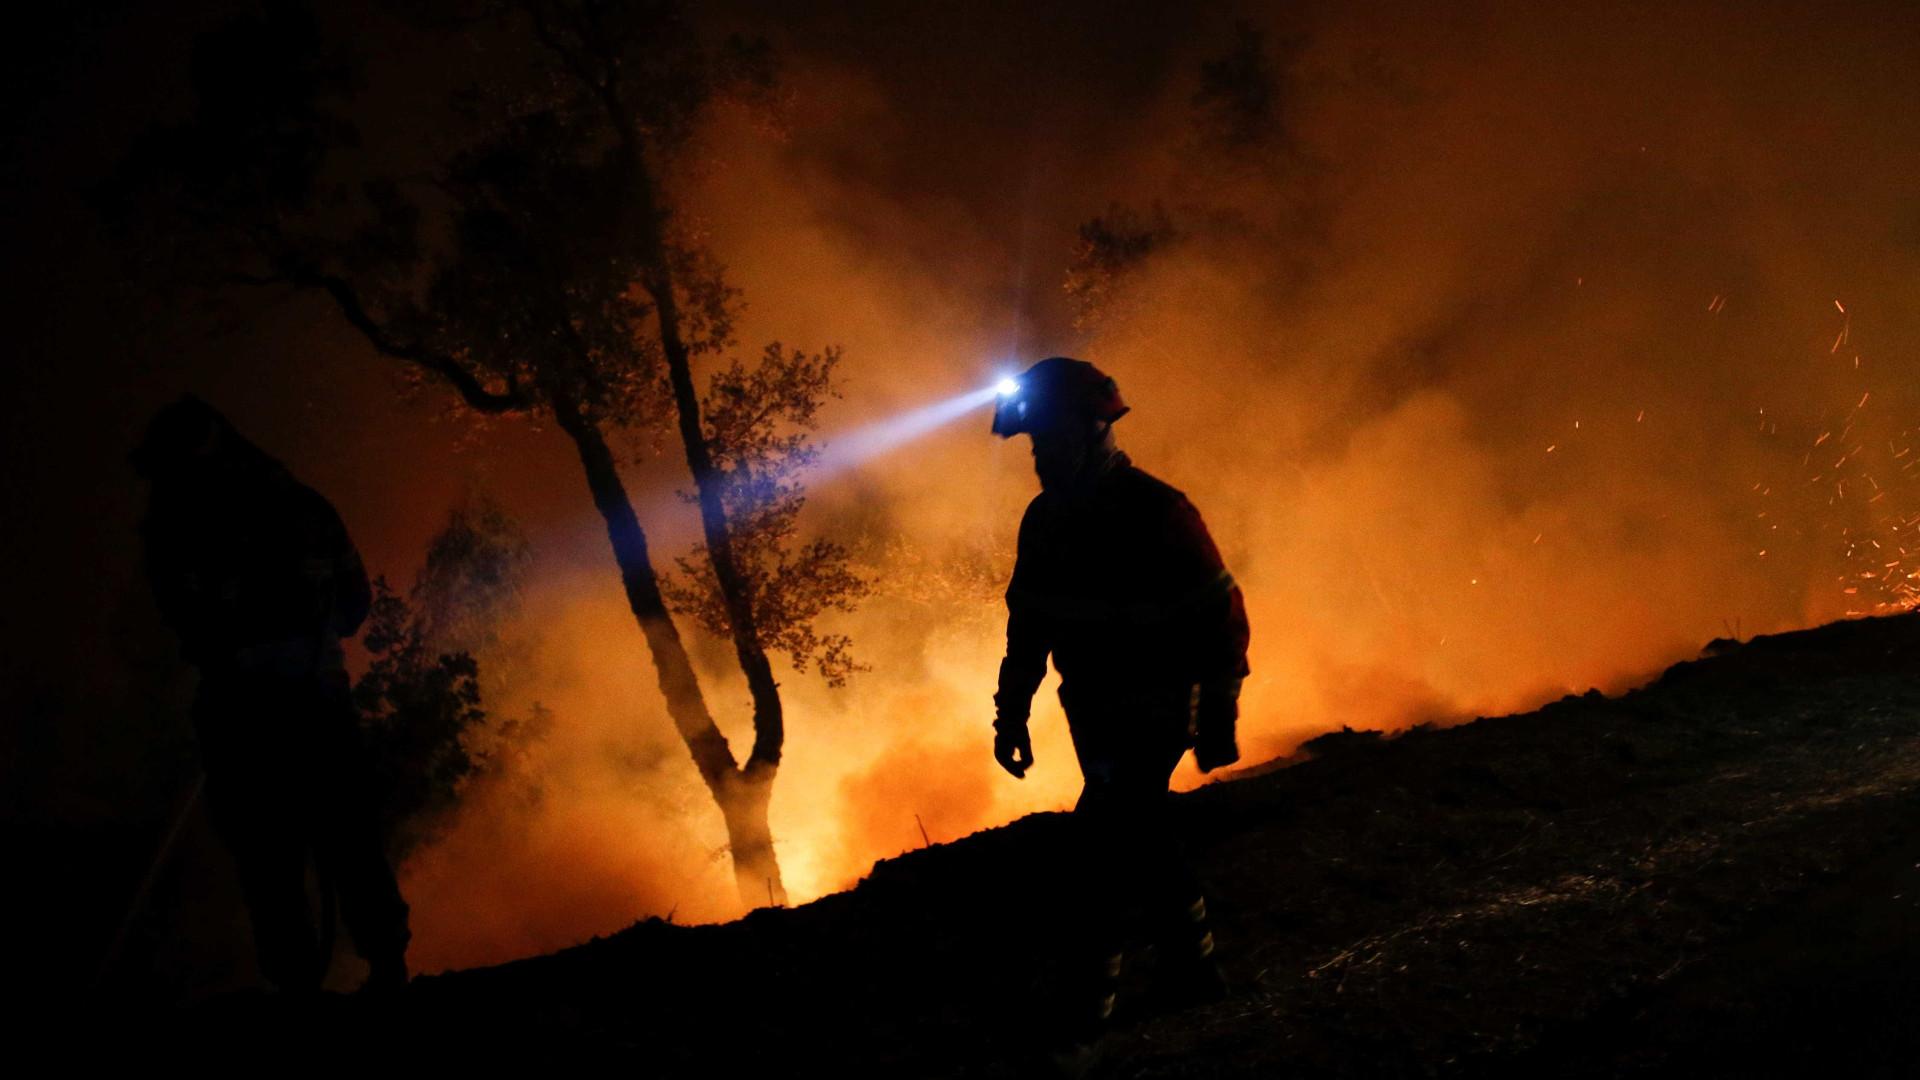 Abertas 90 vagas para vigilantes da natureza contra fogos